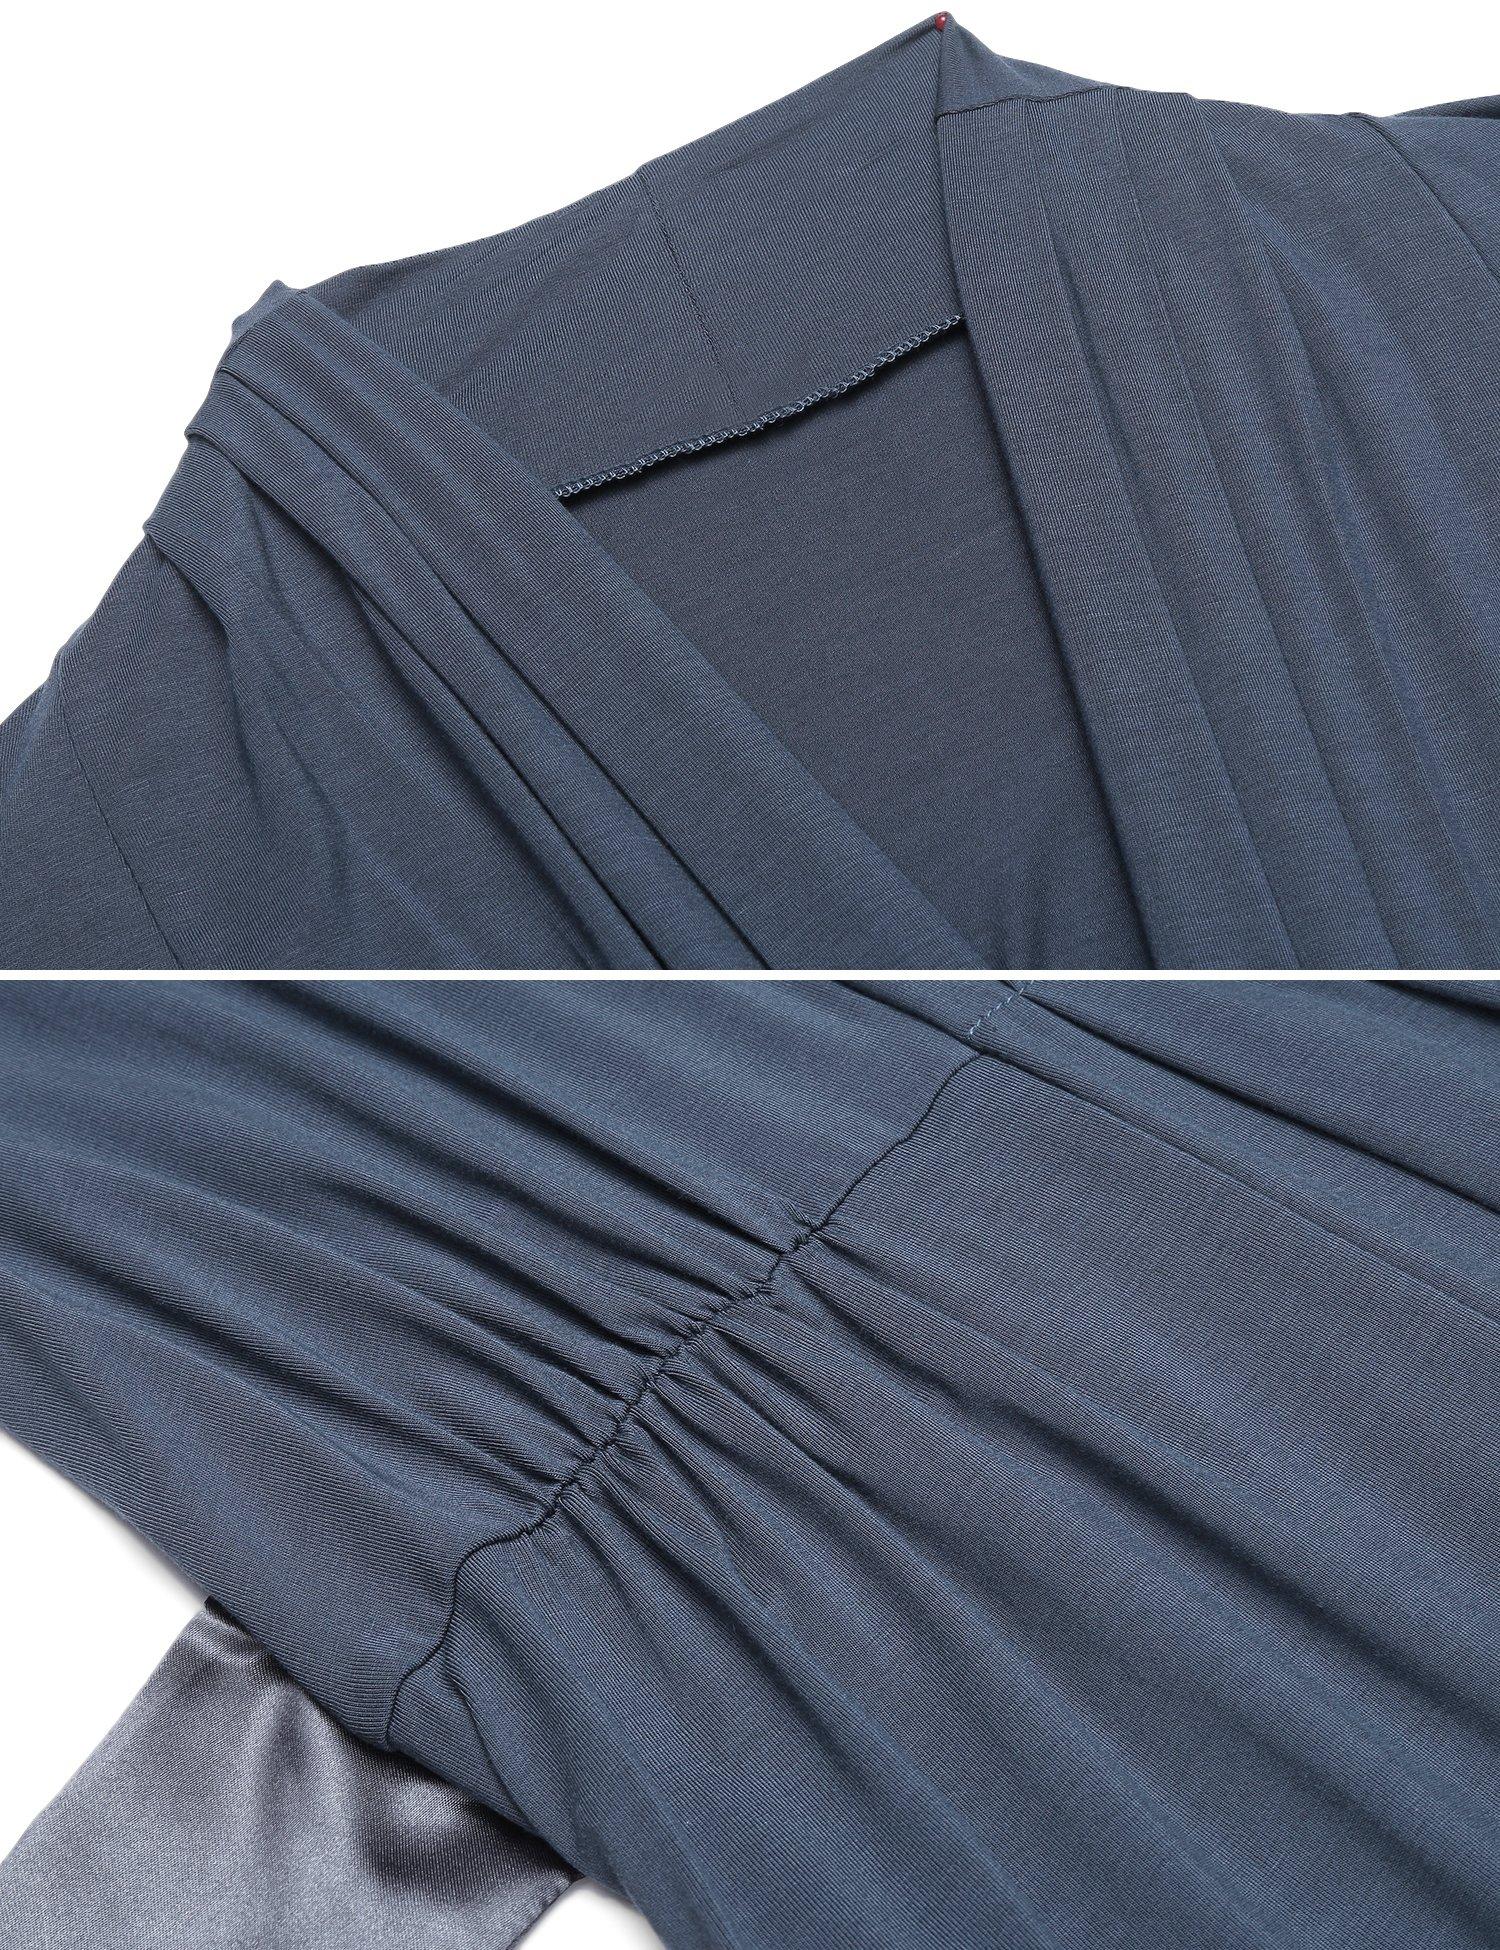 L\'amore Womens Three-quarter Sleeves Bathrobe Stain Waist Belt Kimono Robe Cotton Sleepwear